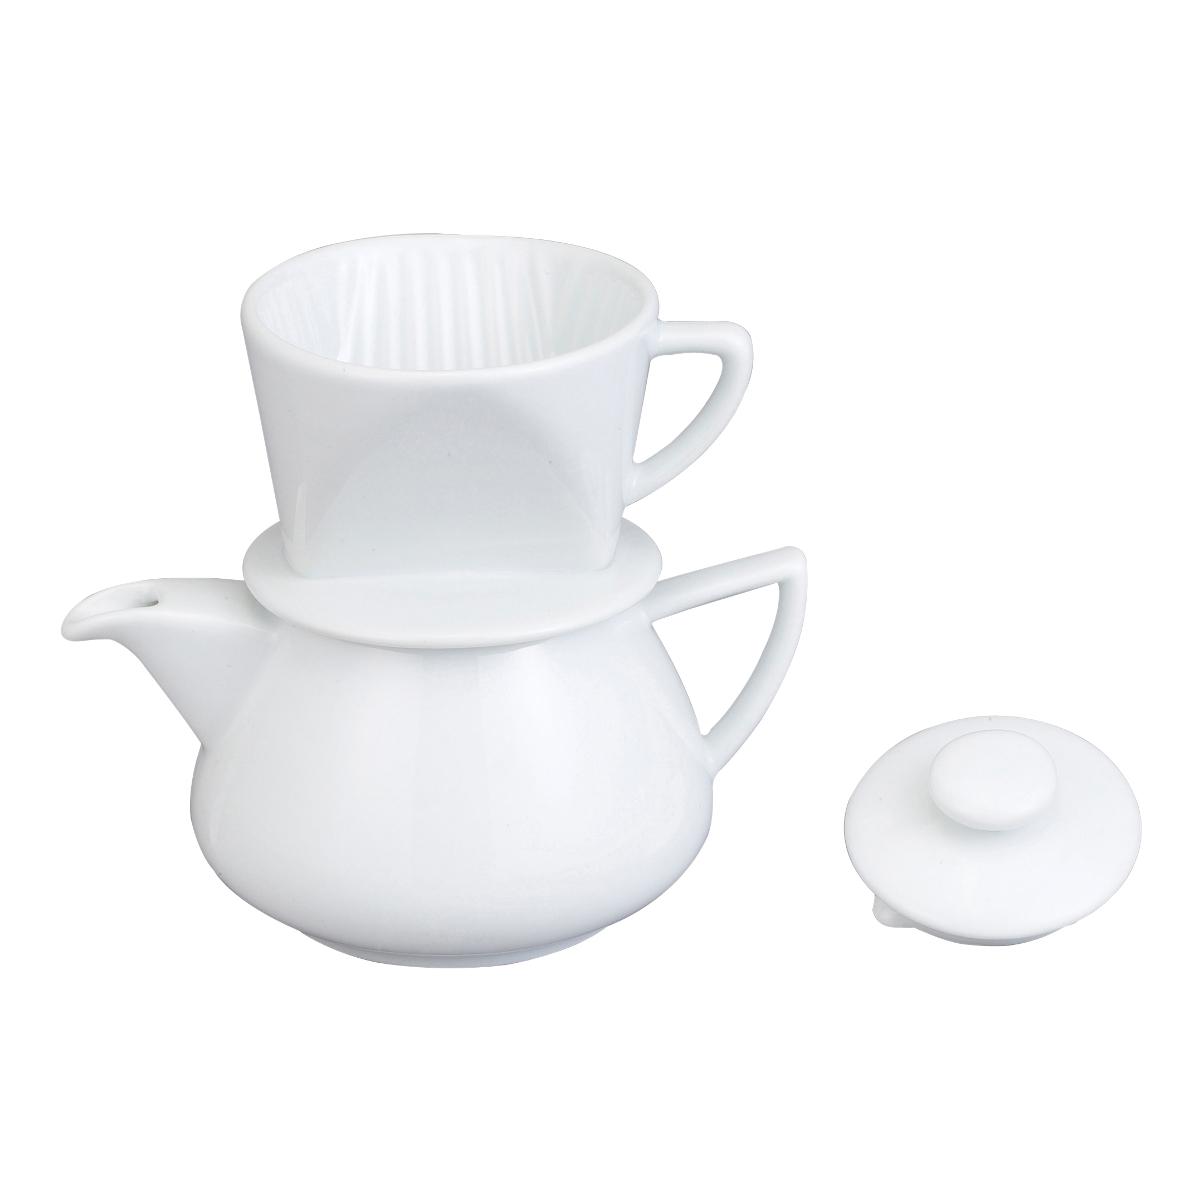 White Ceramic Direct Immersion Coffee Maker